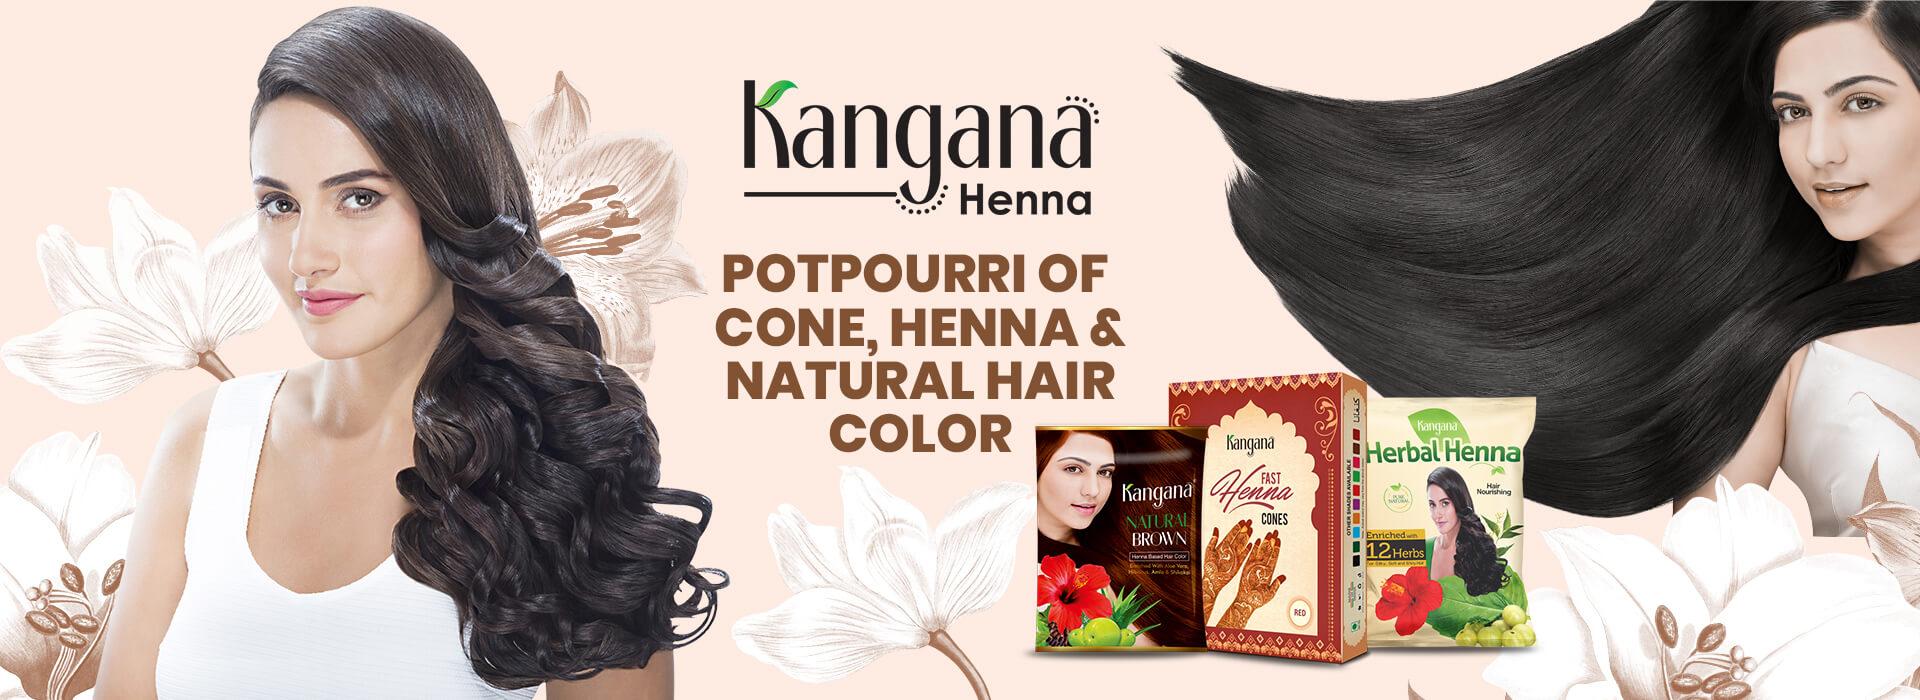 kangana henna potpourri of cone natural hair color